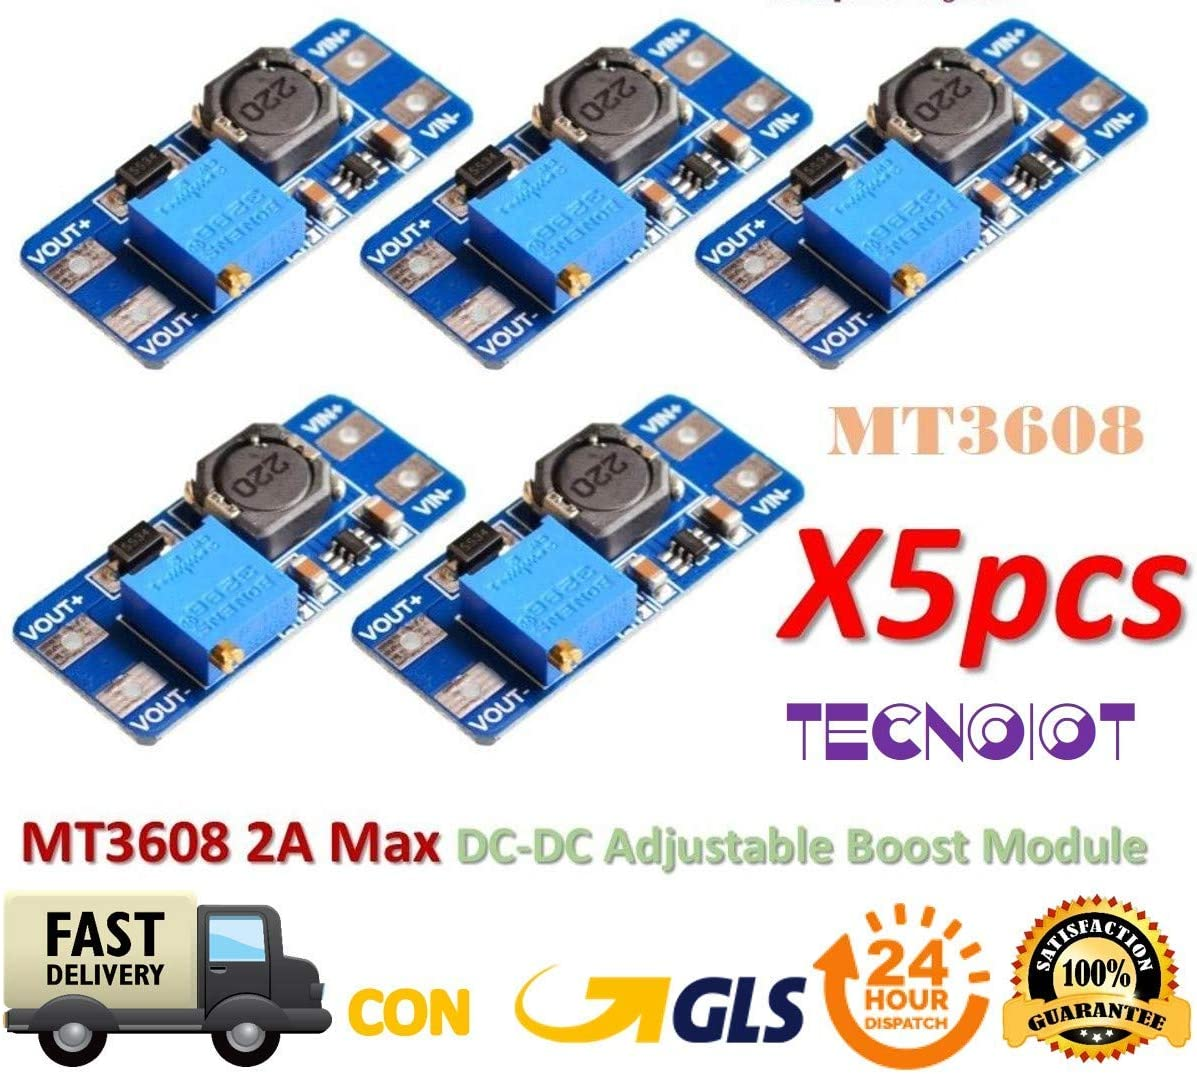 TECNOIOT 5pcs MT3608 2A MAX DC-DC Step Up Power Module Booster Power Module